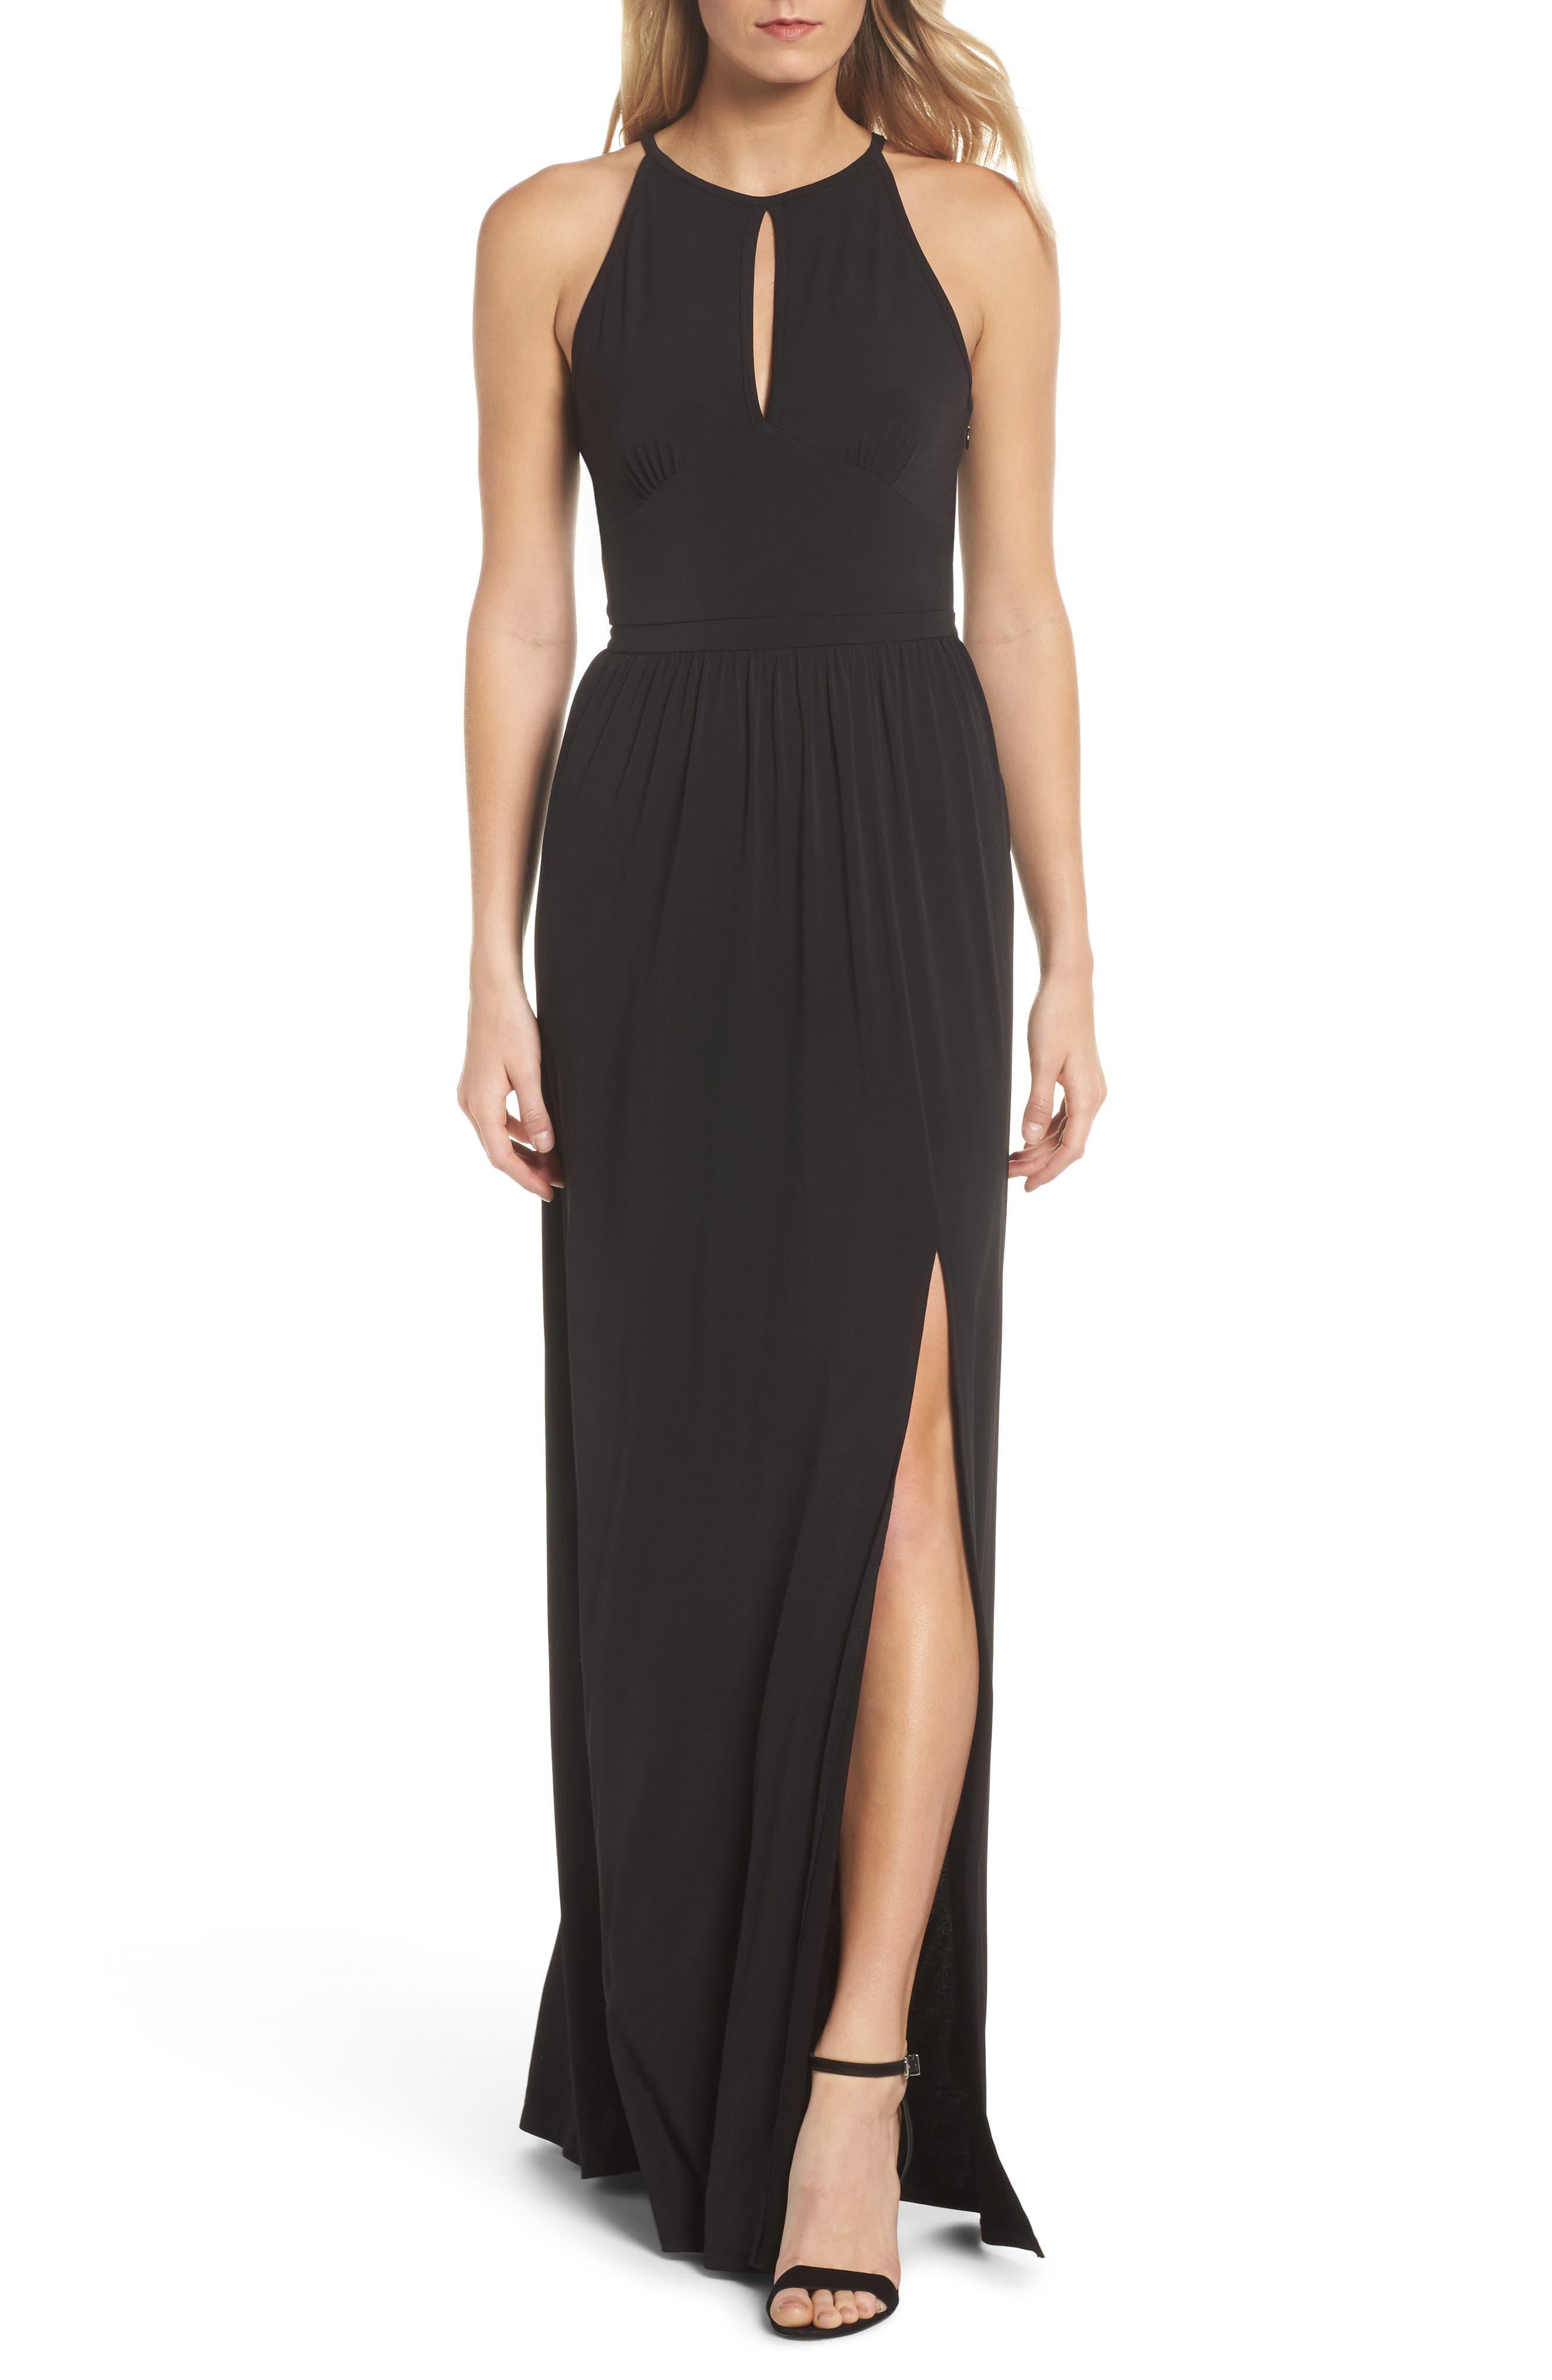 Michael Kors Long Prom Dresses